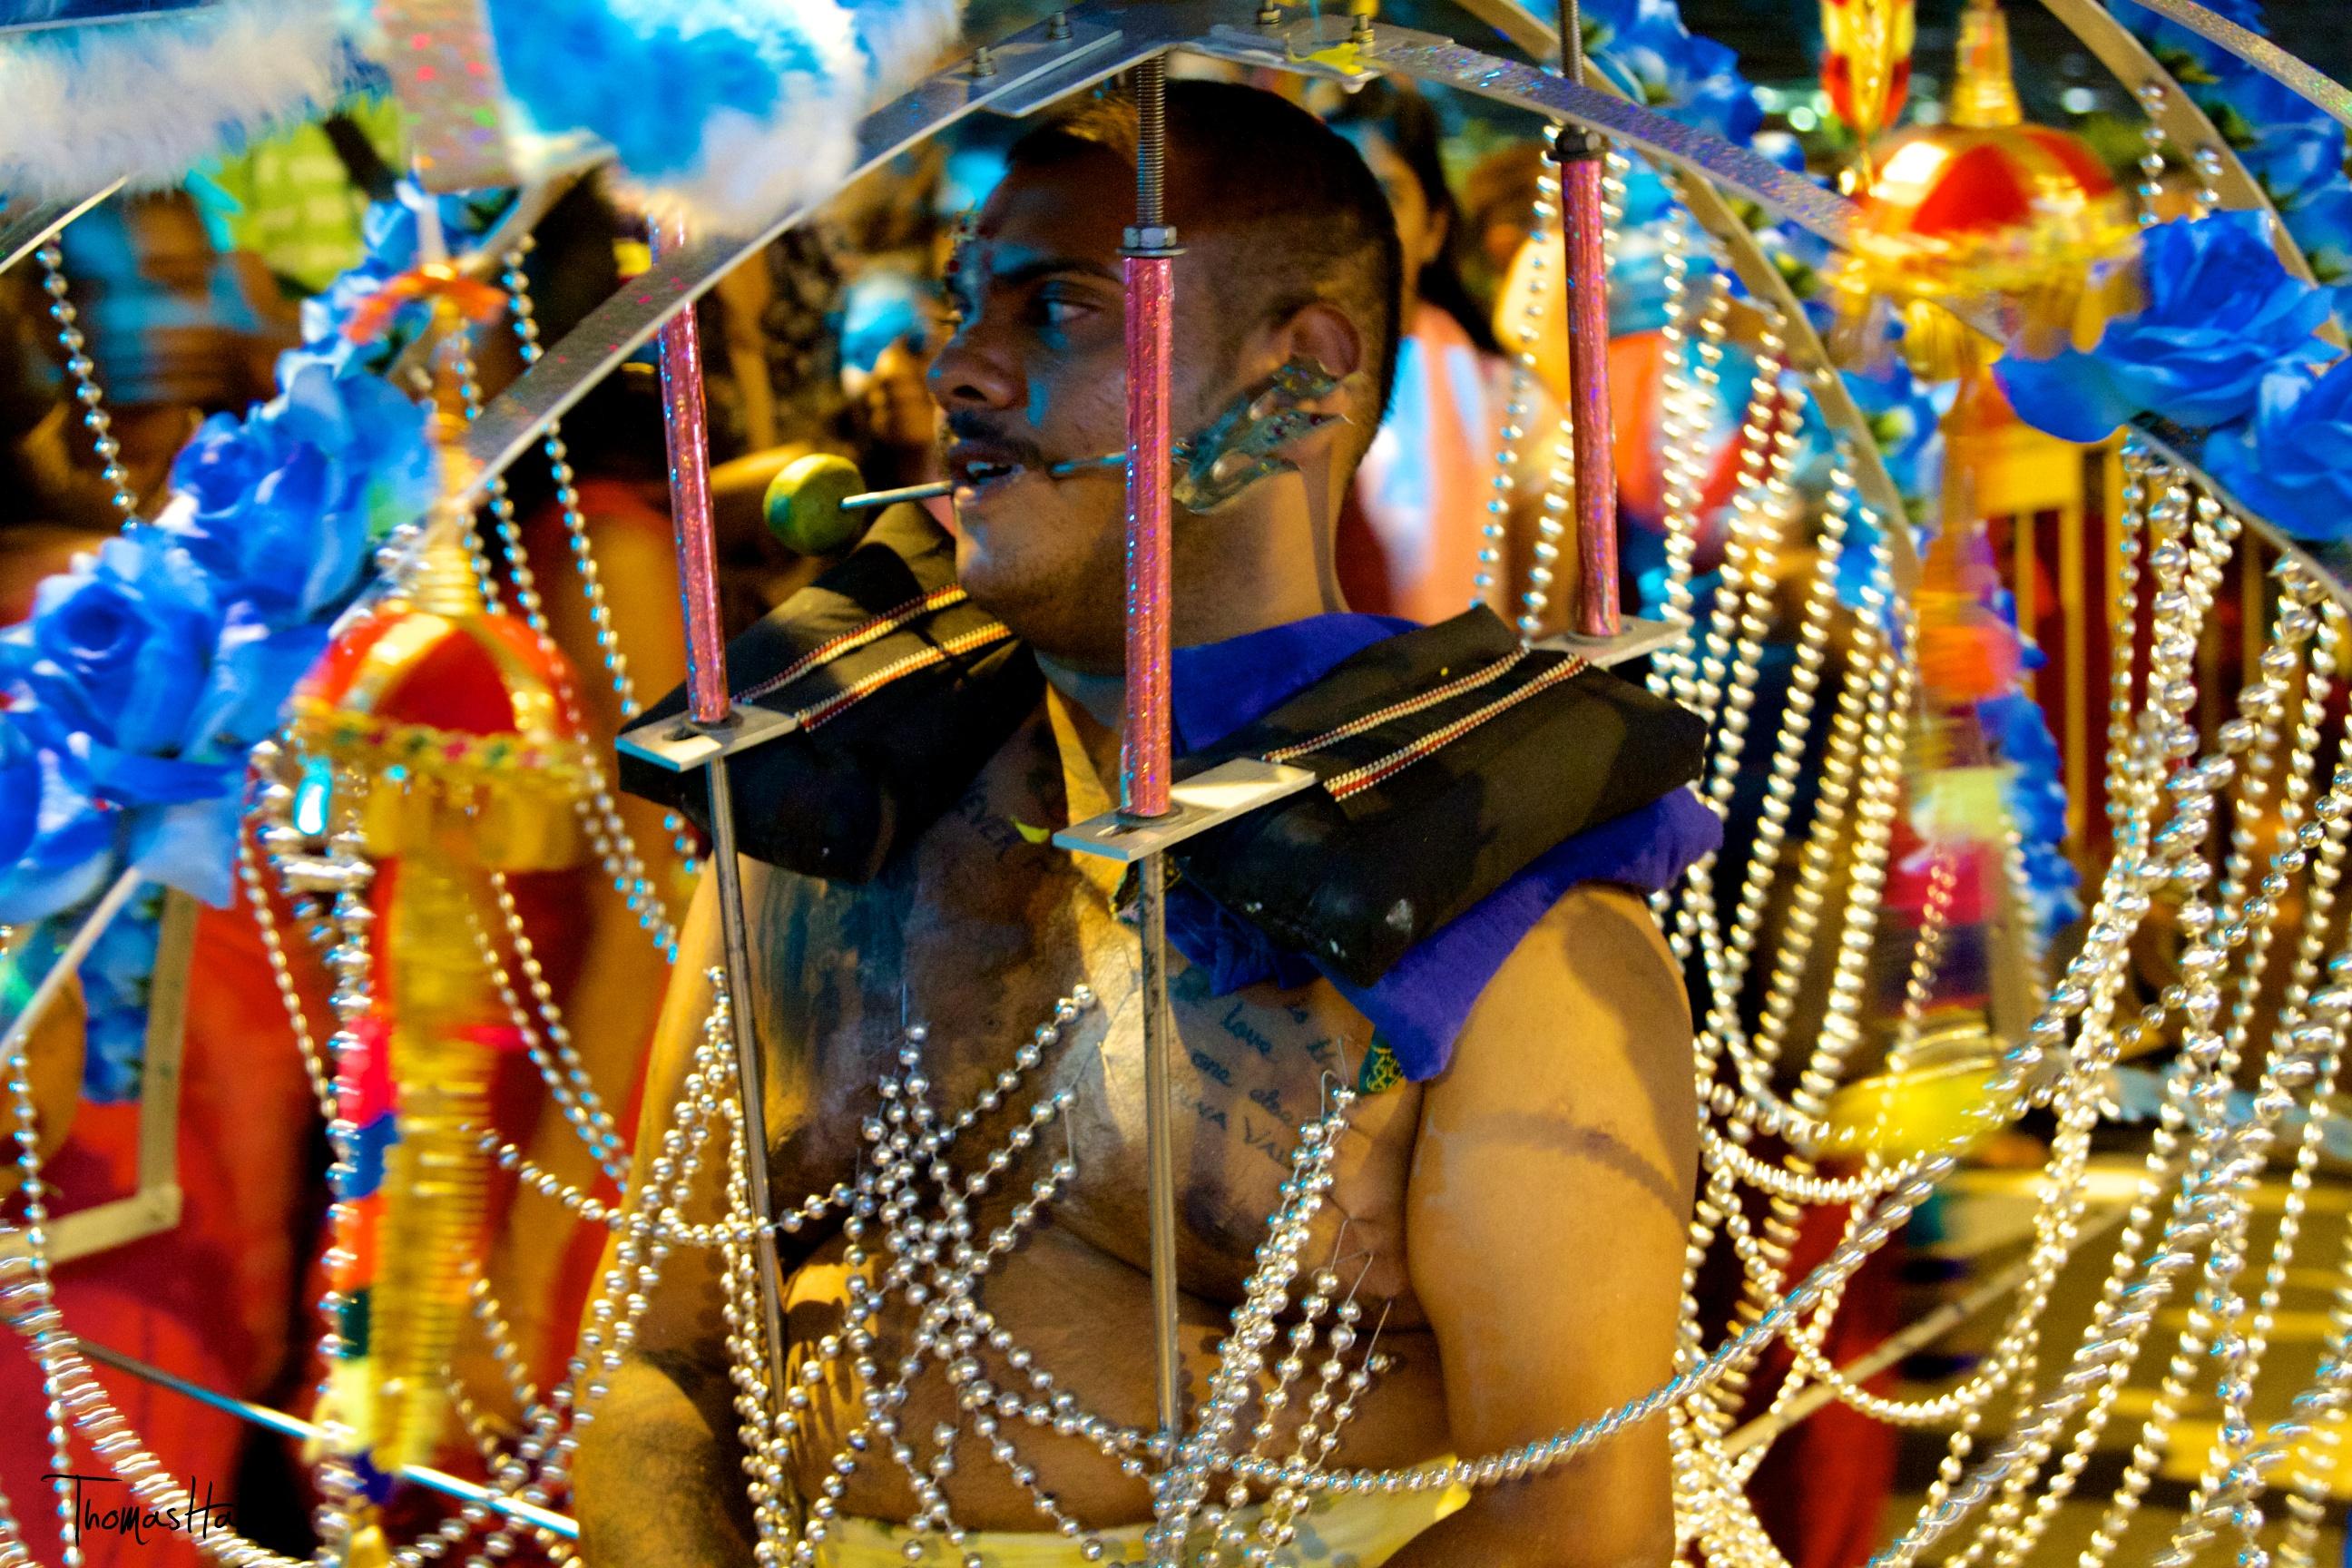 Hasil gambar untuk Thaipusam, The Hindu Piercing Festival